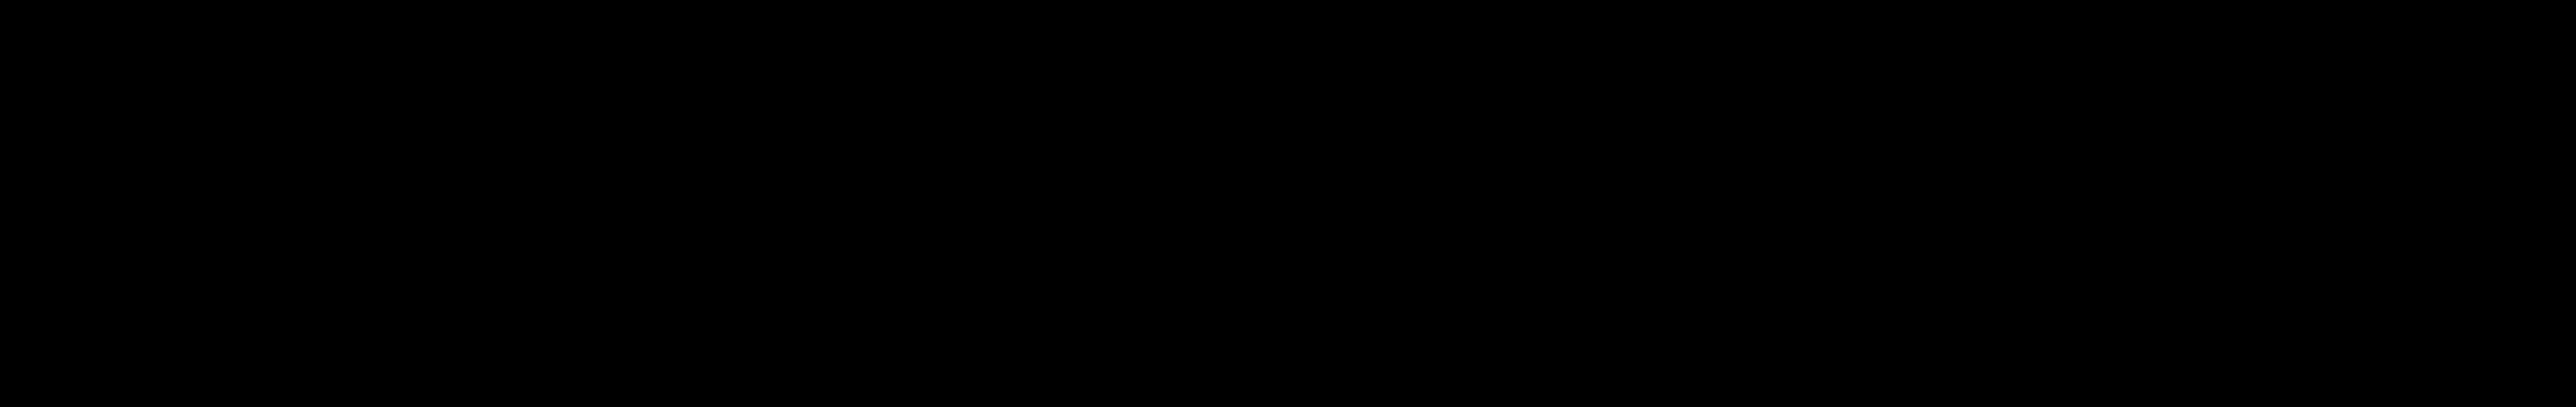 panasonic logo 8 - Panasonic Logo